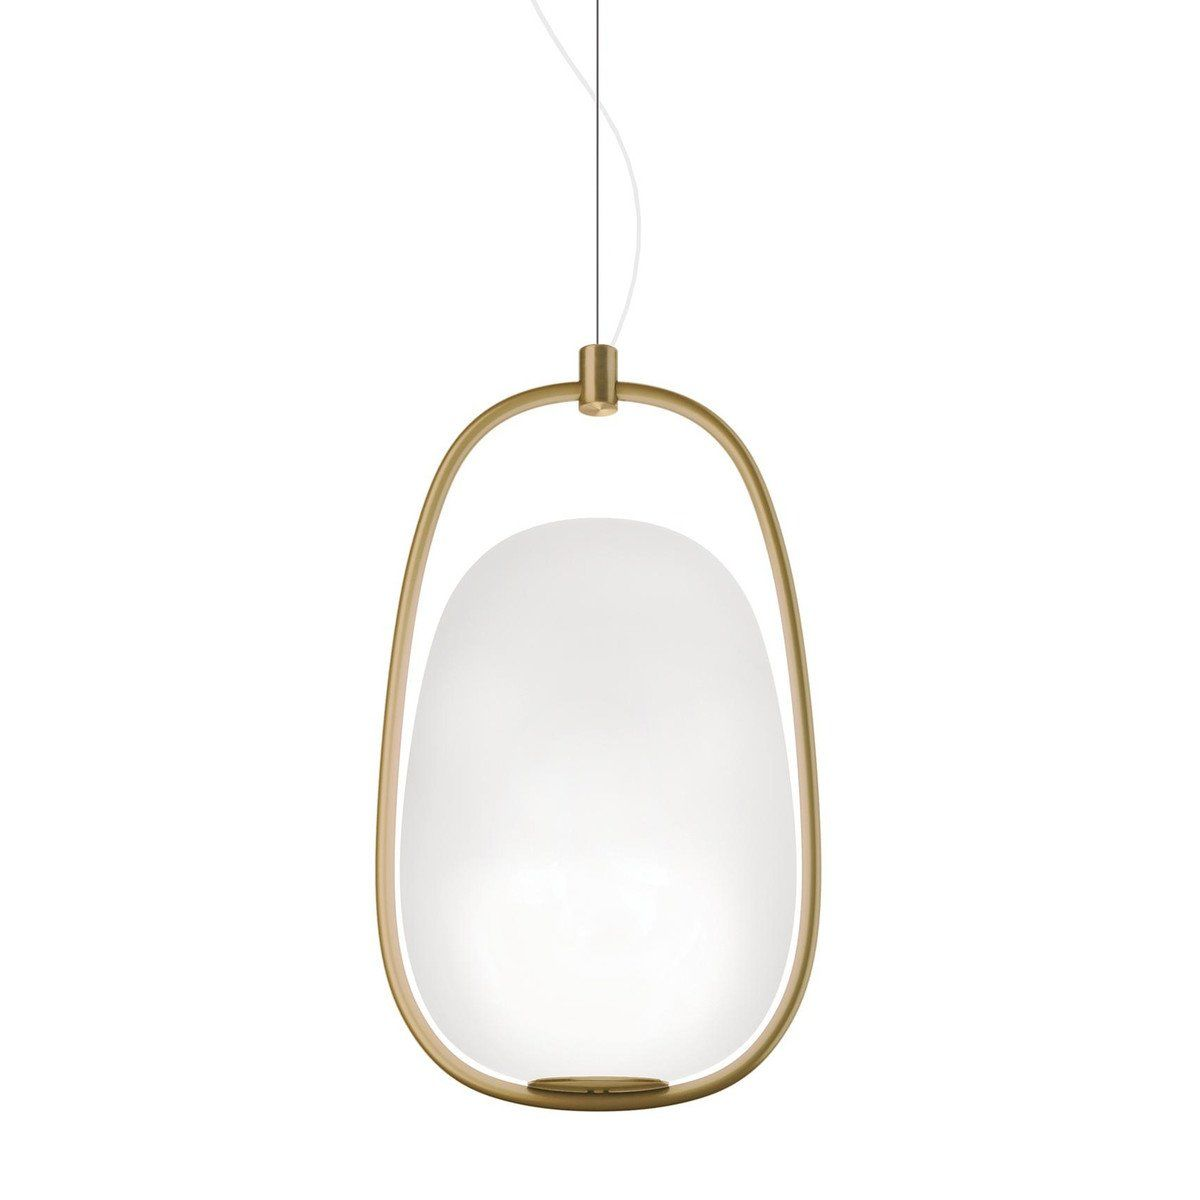 Kundalini - Lannà Suspension L& - brass/white/canopy ...  sc 1 st  AmbienteDirect & Lannà Suspension Lamp | Kundalini | AmbienteDirect.com